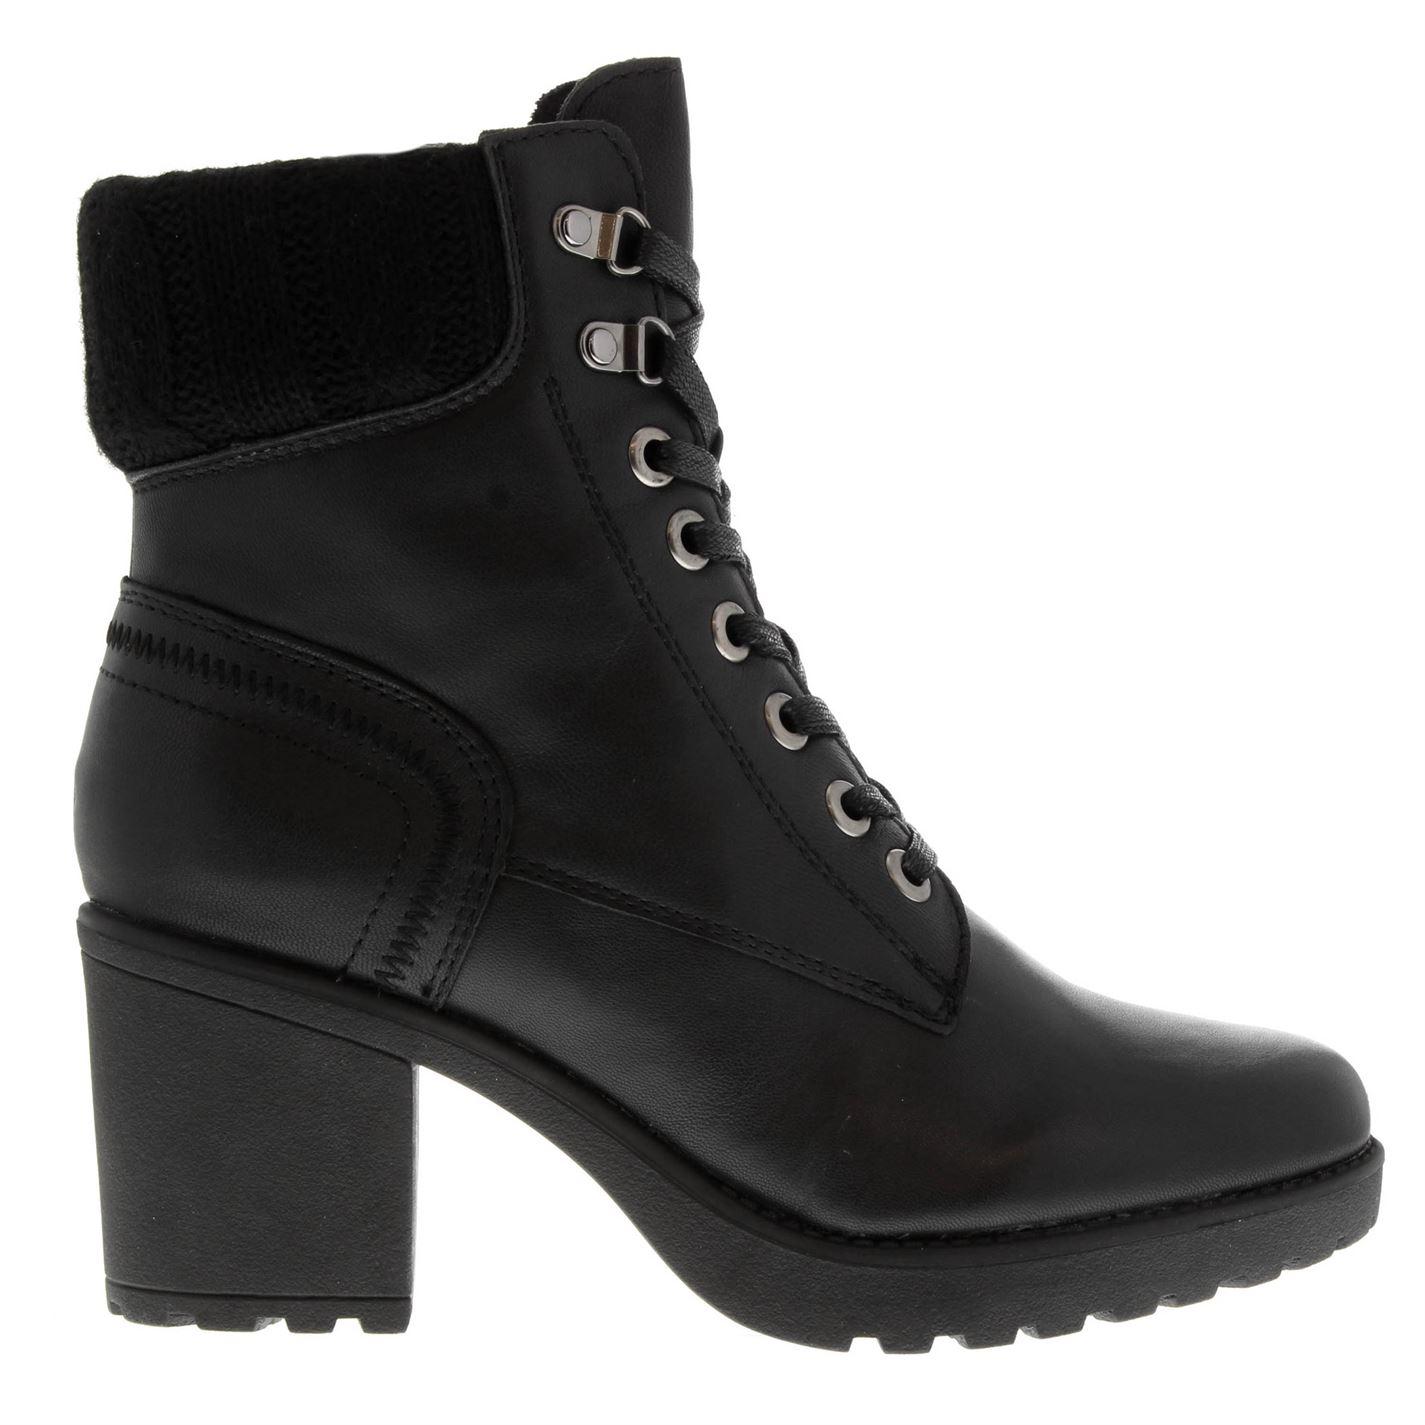 Firetrap Echo Hiker Boots Ladies